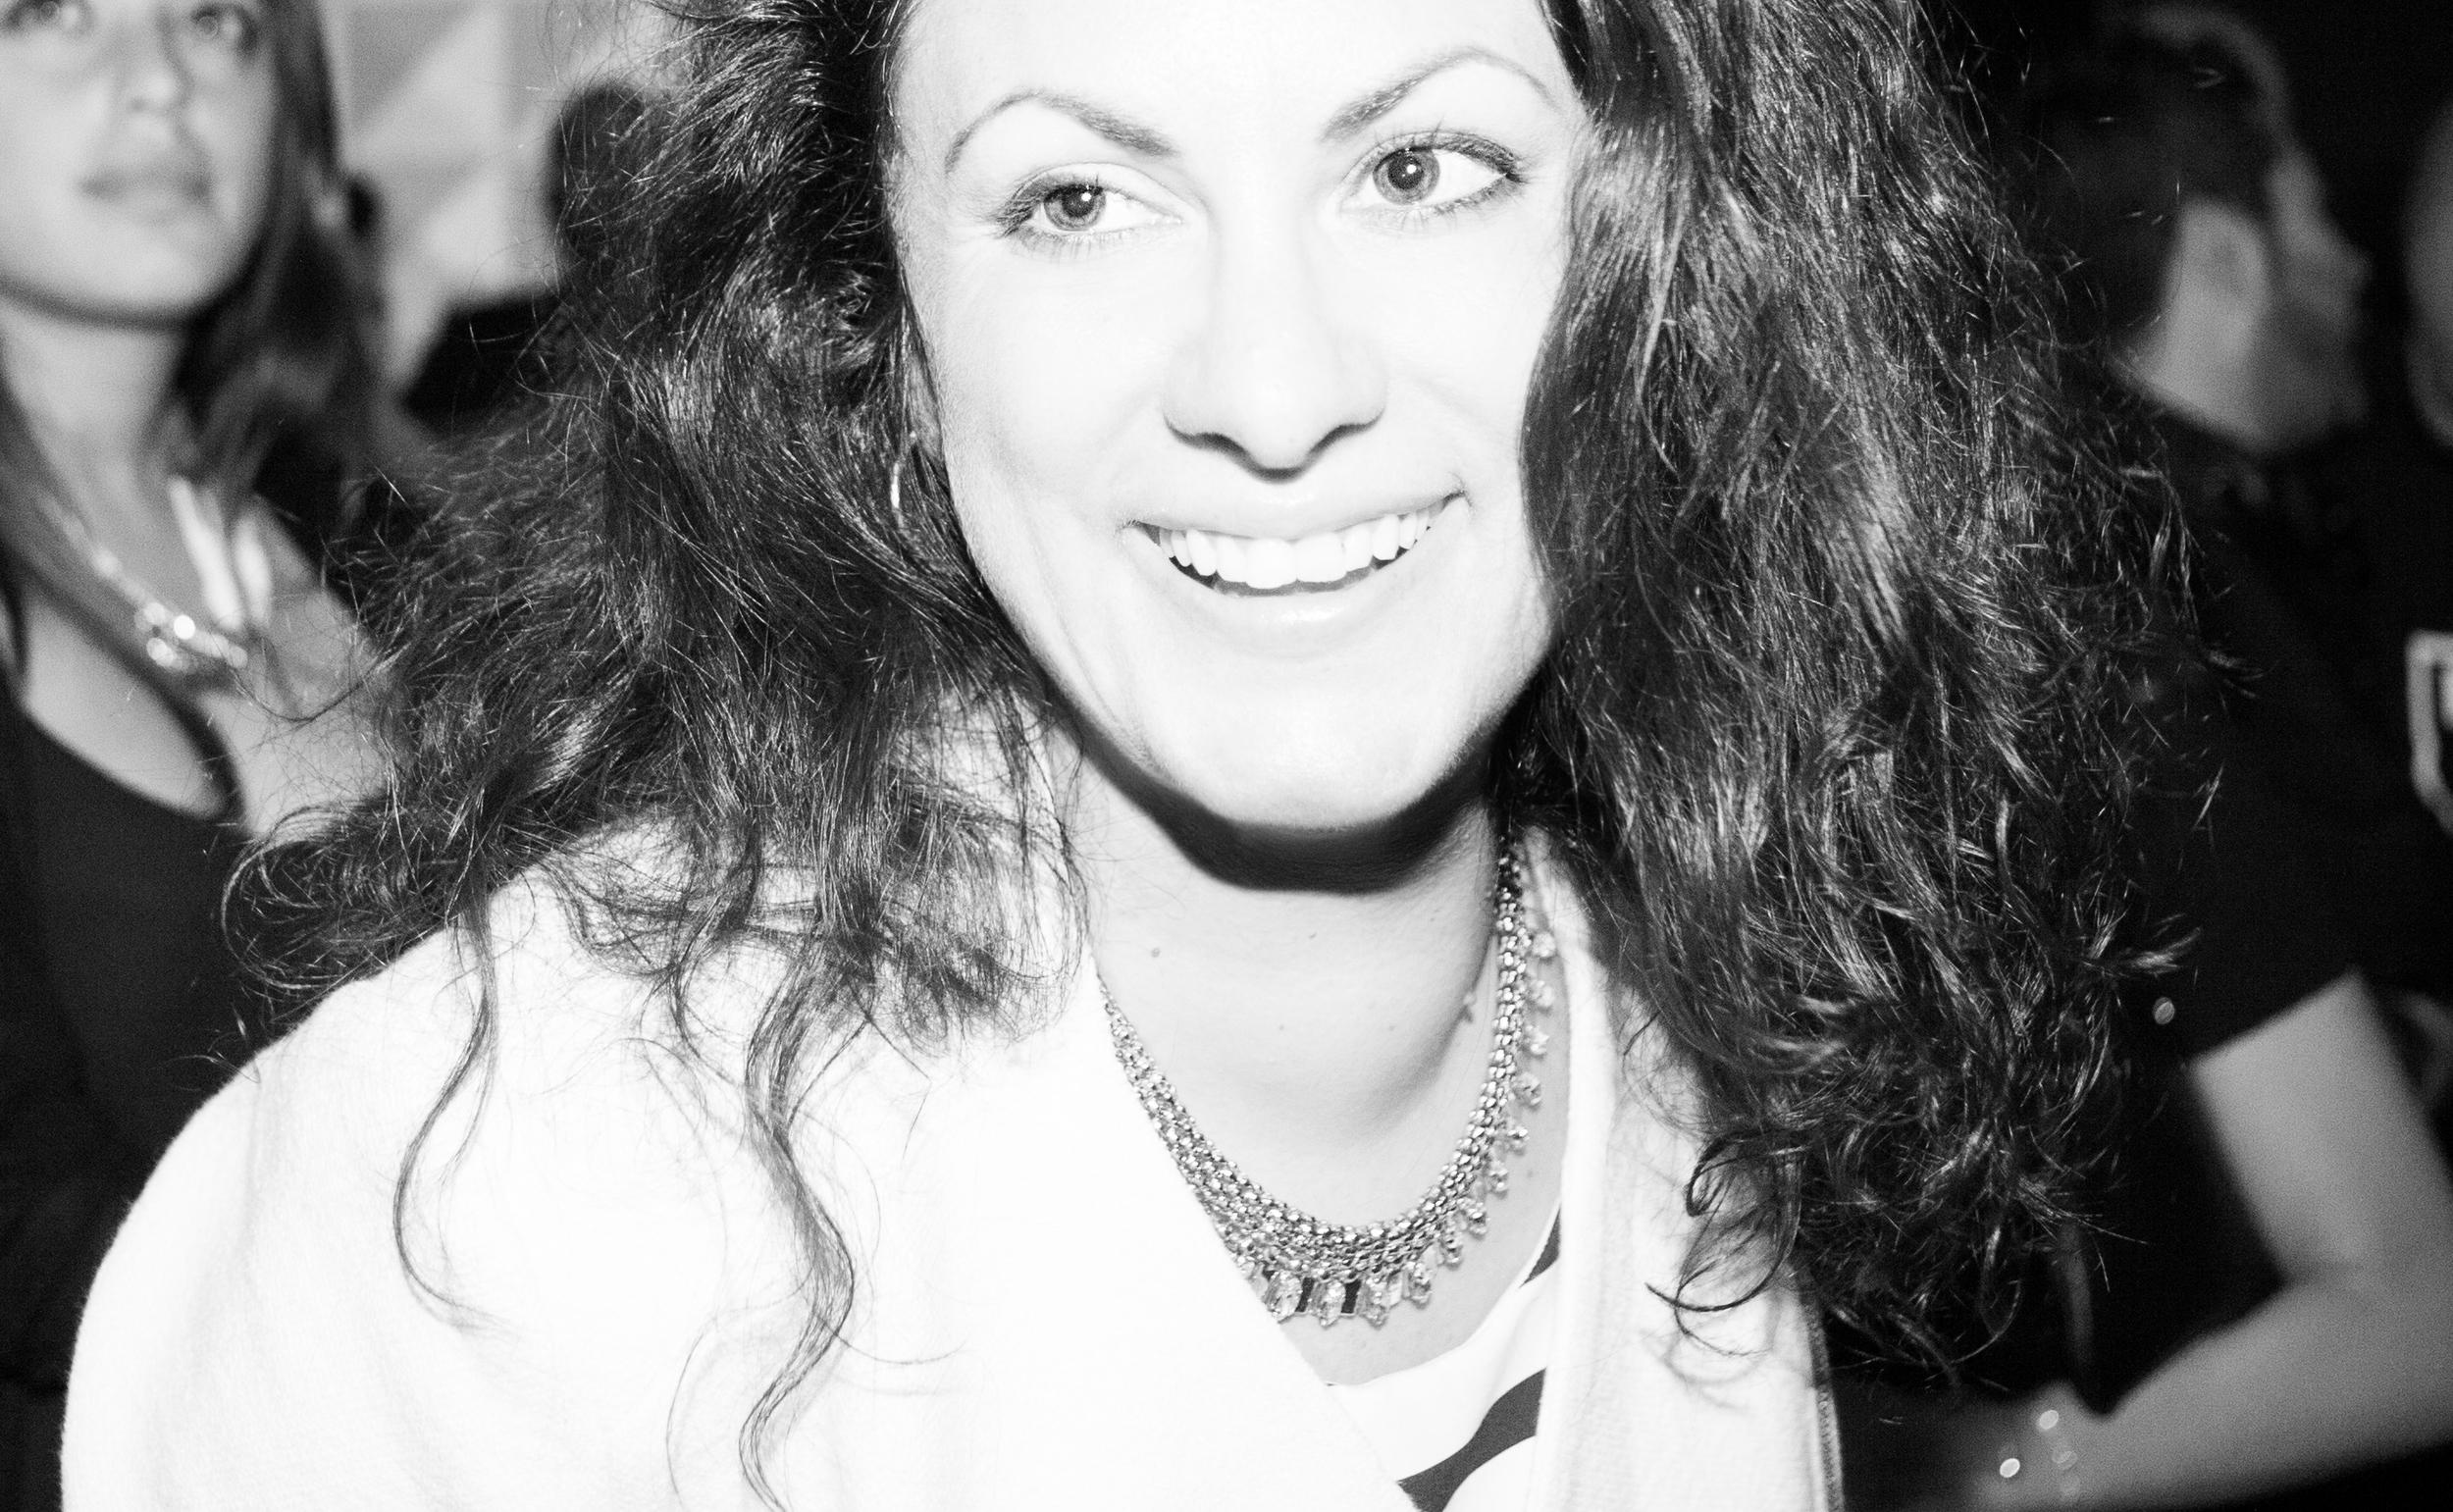 patricia brochu photographe mademoiselle jules mlle